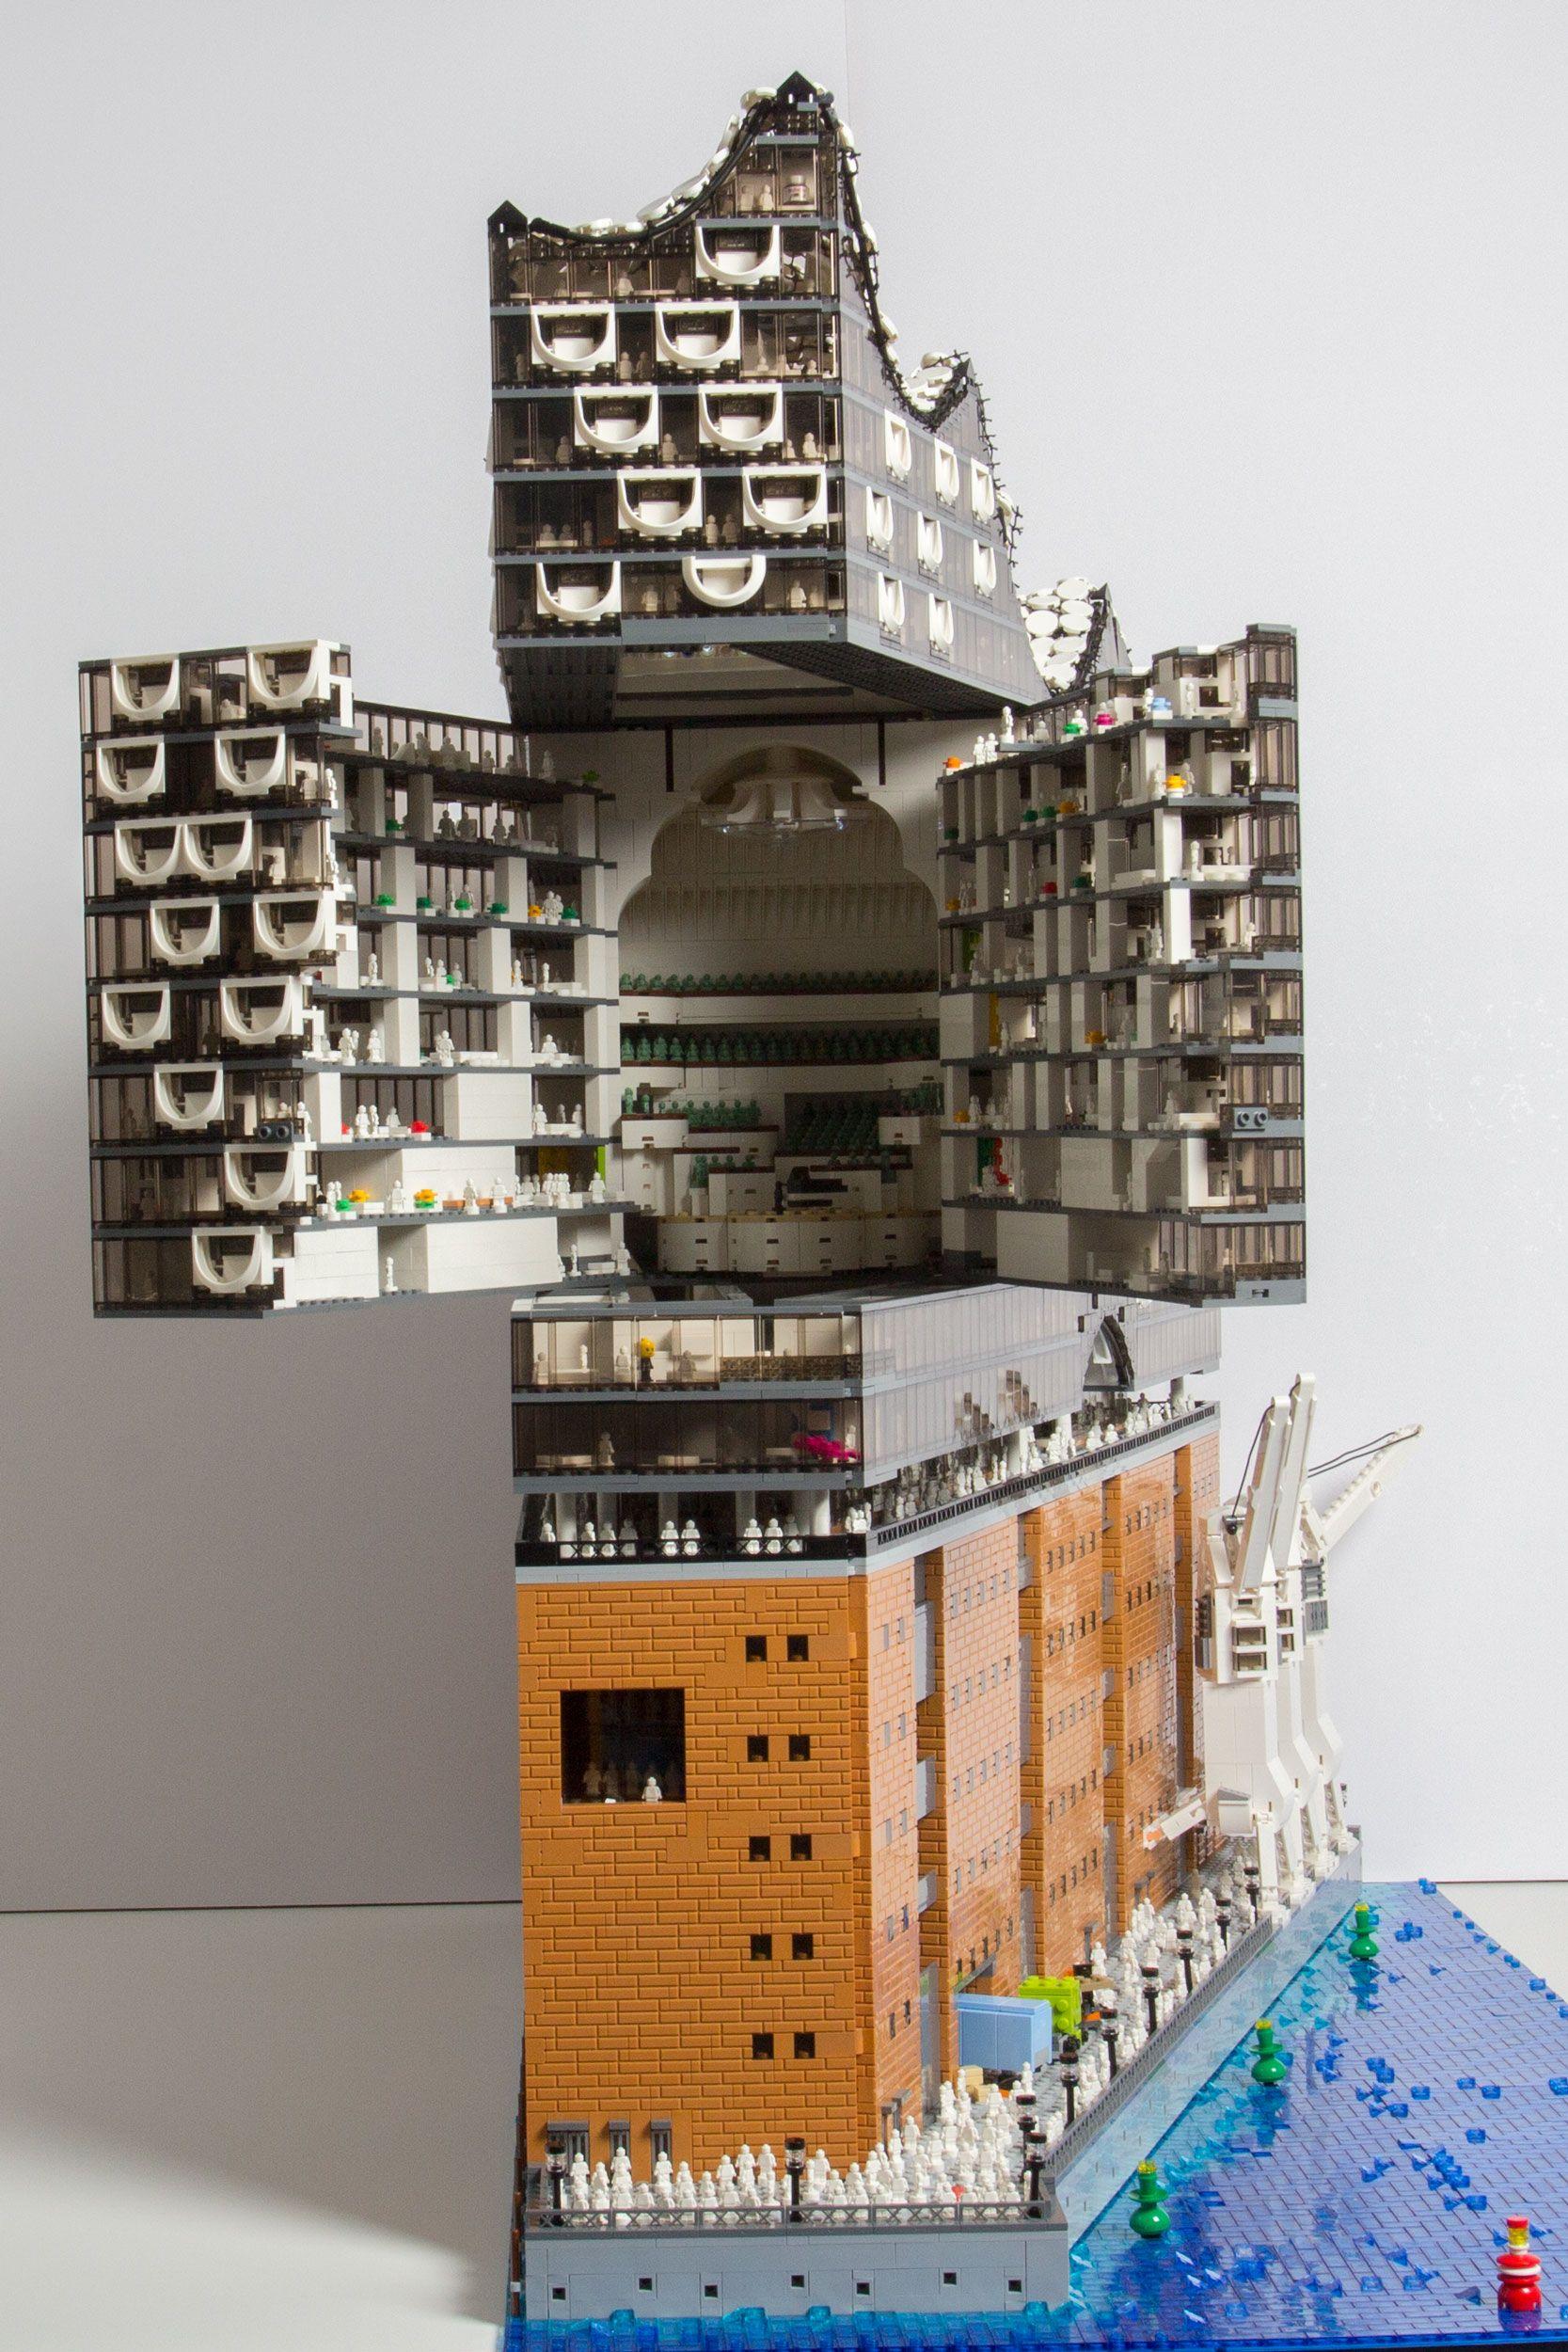 Elbphilharmonie Lego